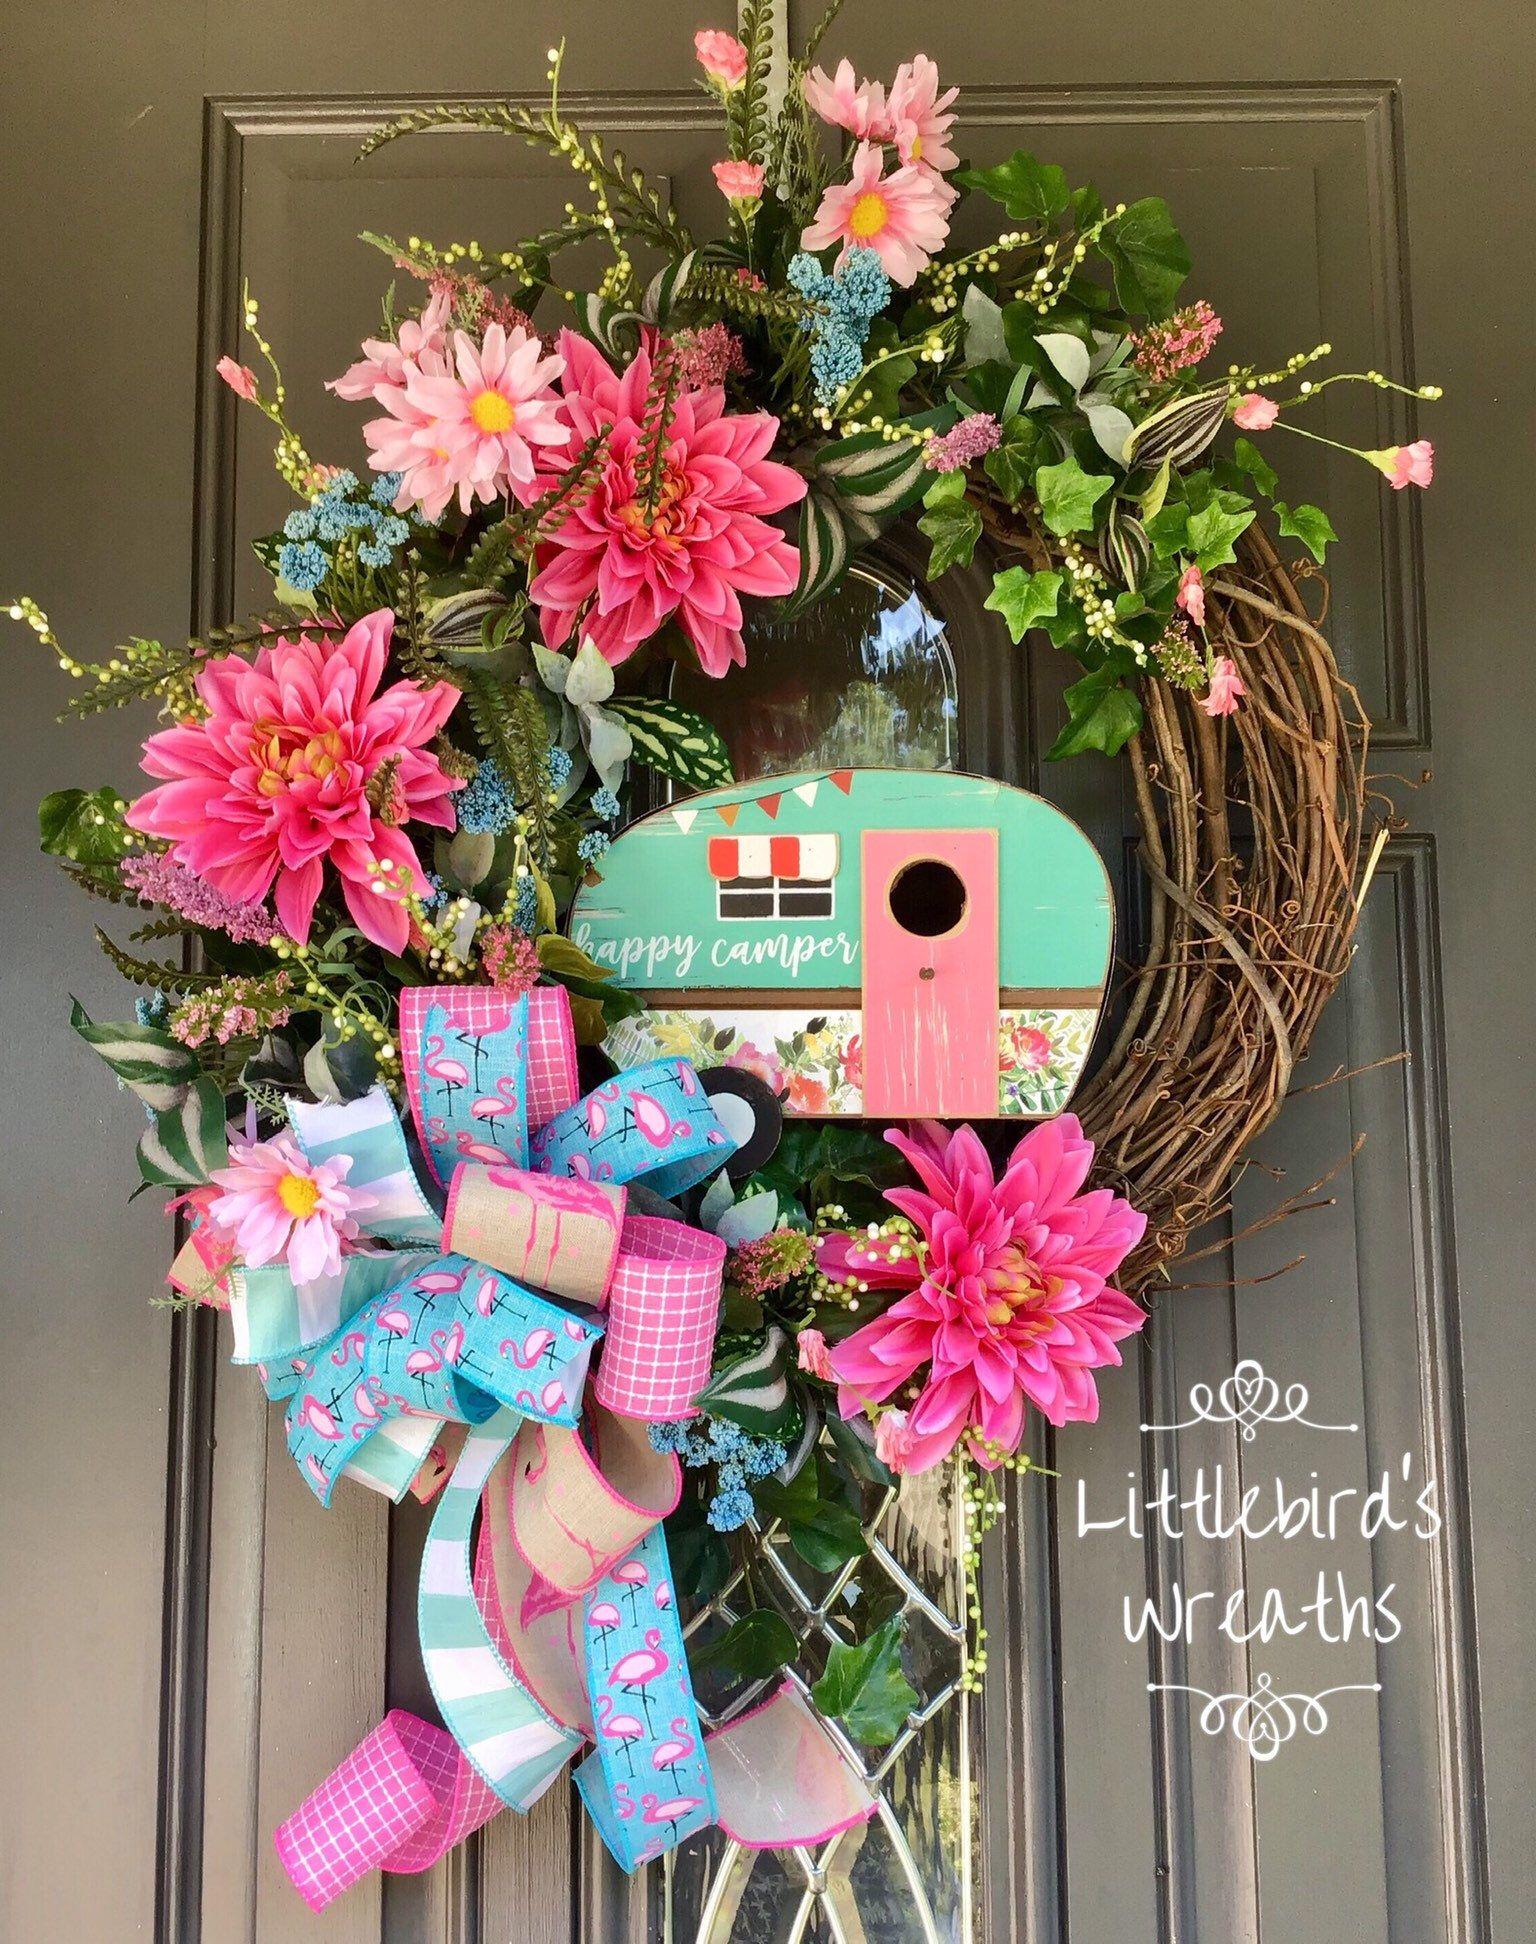 Photo of Camping wreath, summer decor, flamingo wreath, floral wreath, front door wreath, floral mobile wreath